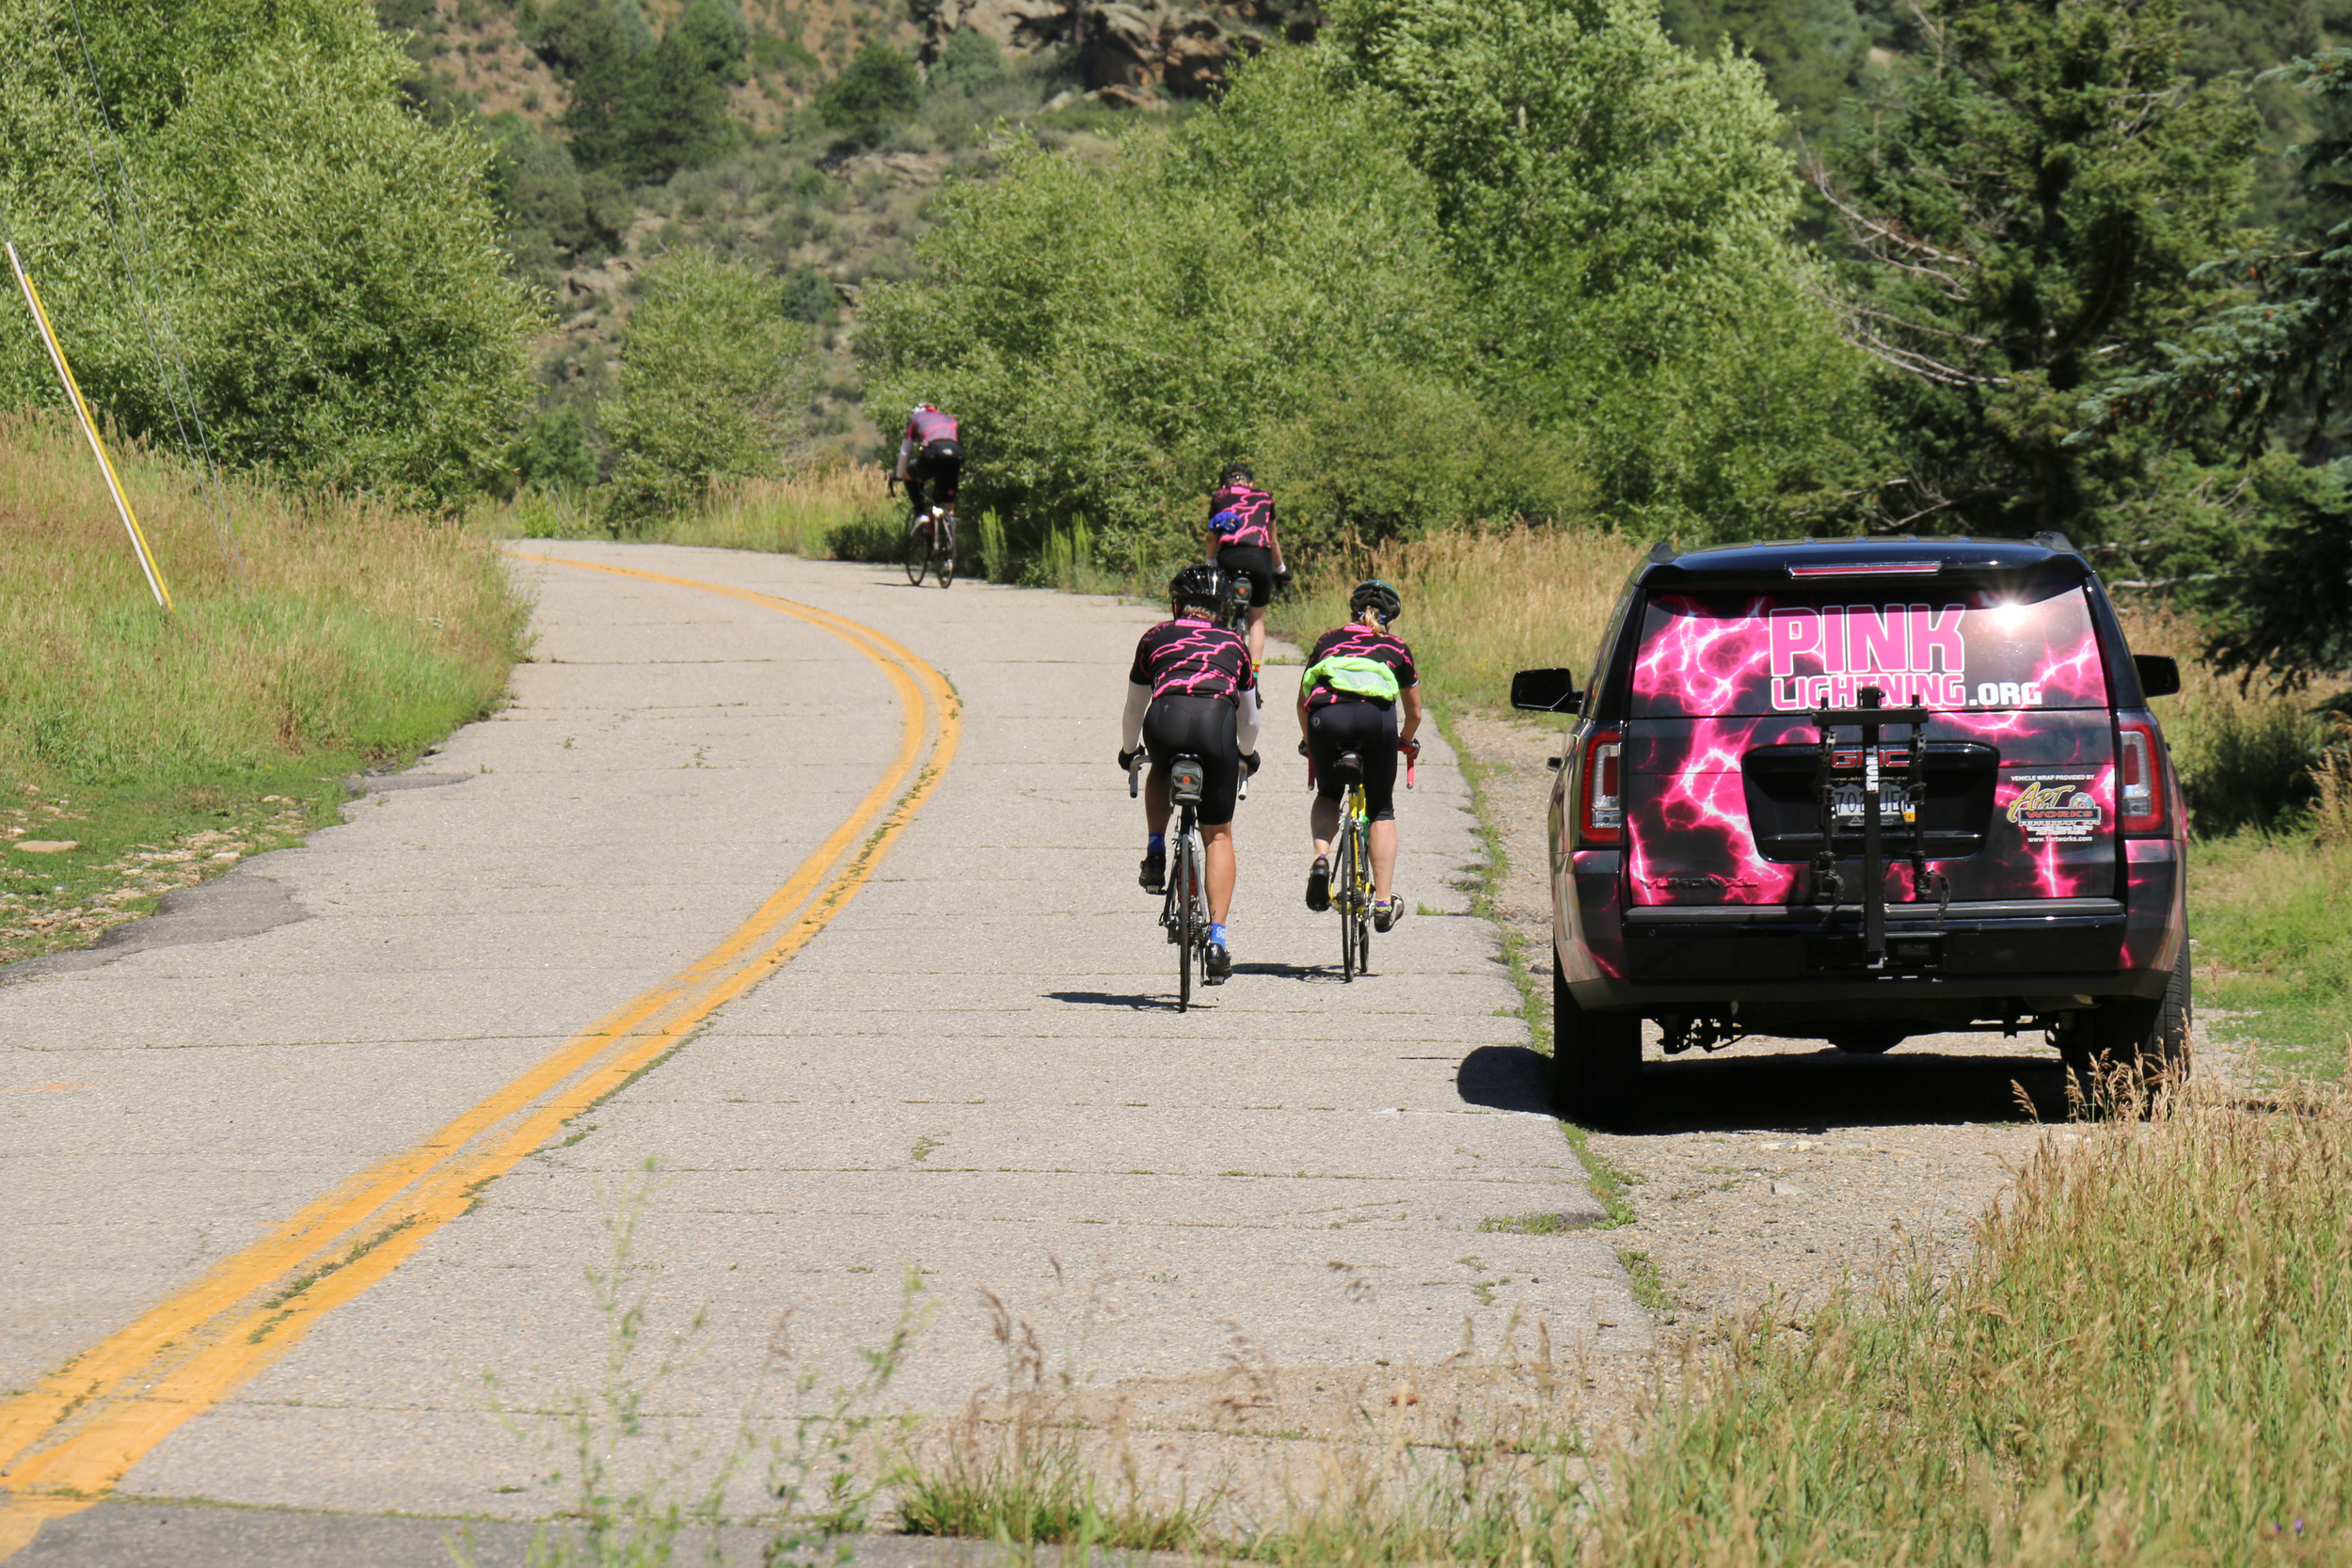 The Team heads to Idaho Springs